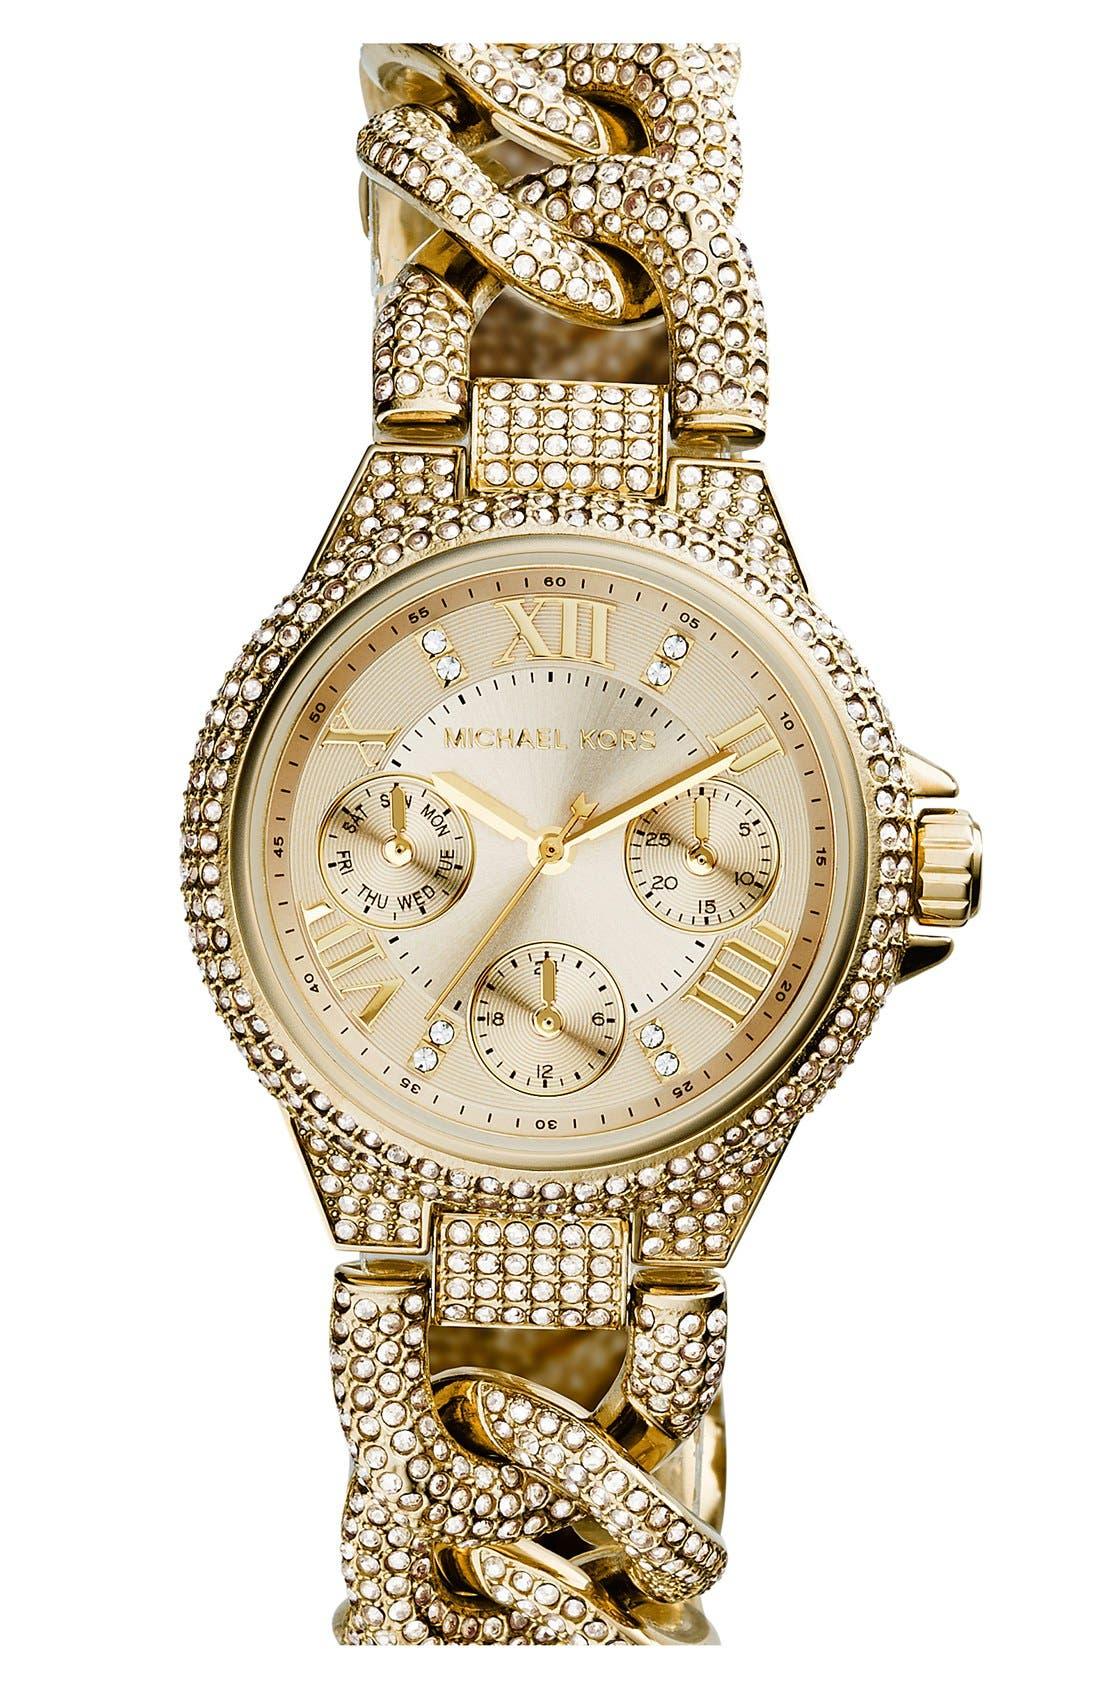 Main Image - Michael Kors 'Mini Camille' Crystal Encrusted Chain Link Bracelet Watch, 34mm